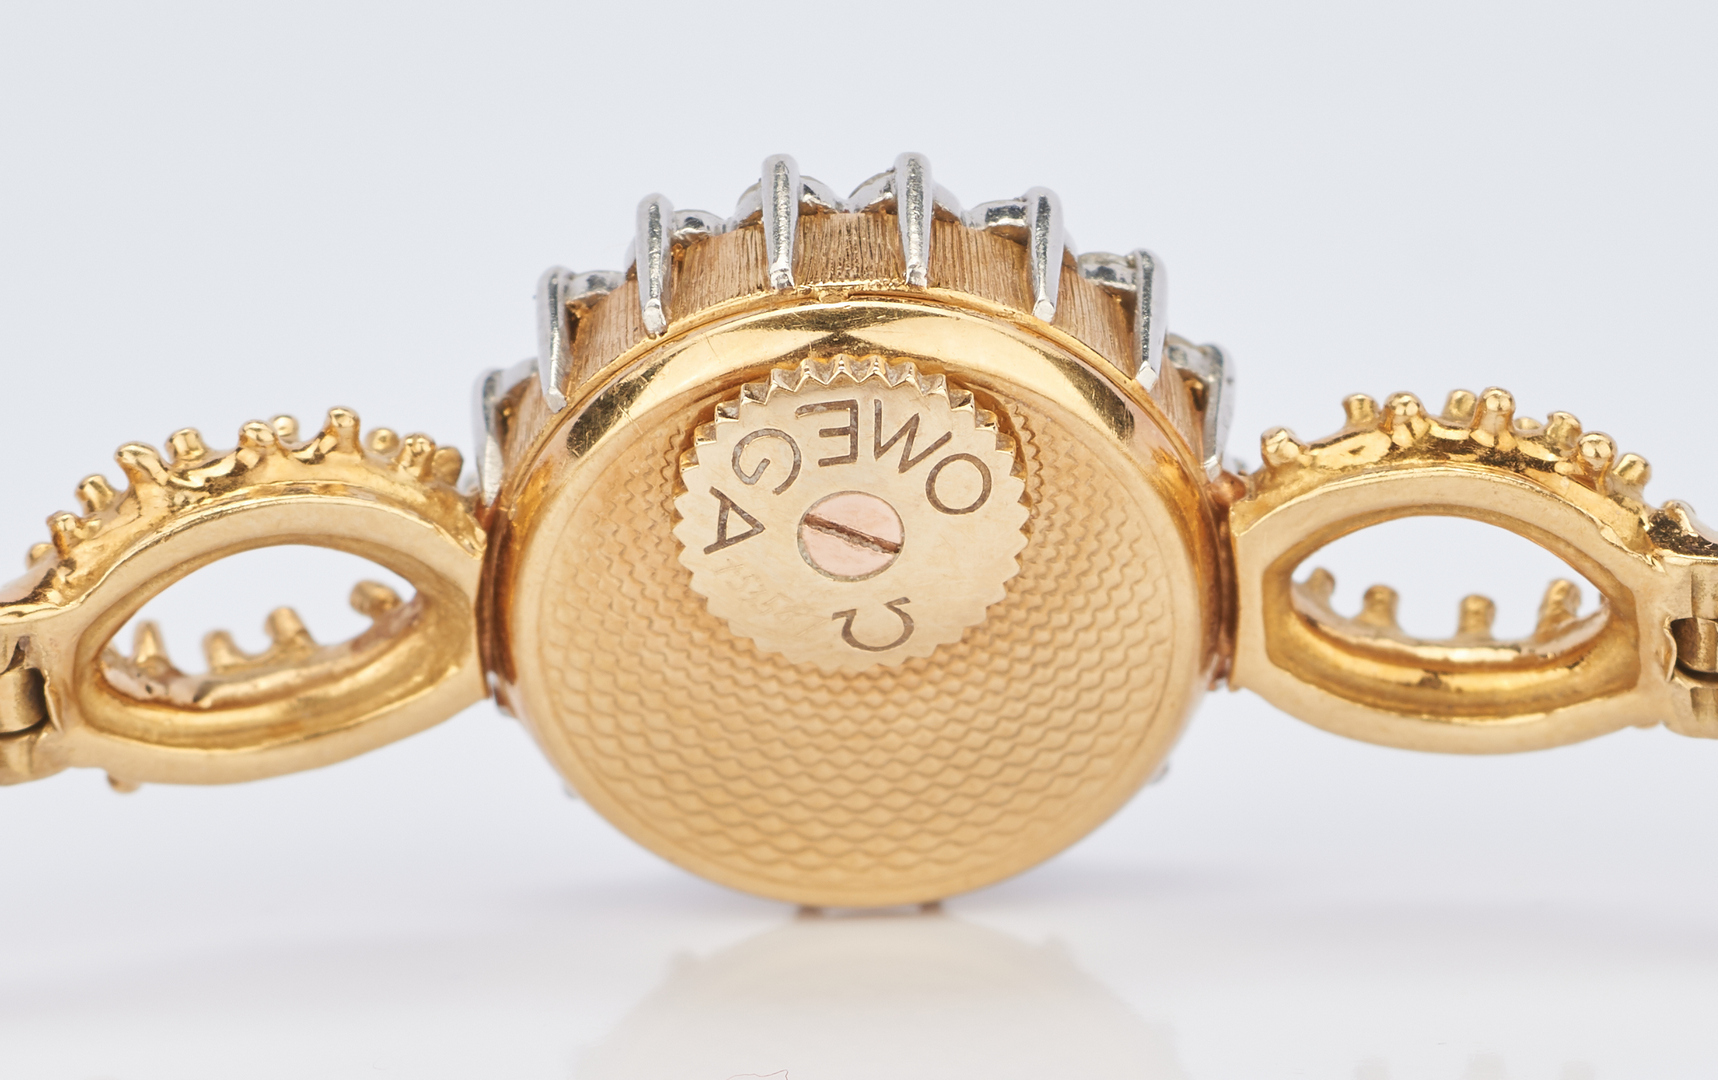 Lot 232: 18K Ladies Omega Wrist Watch